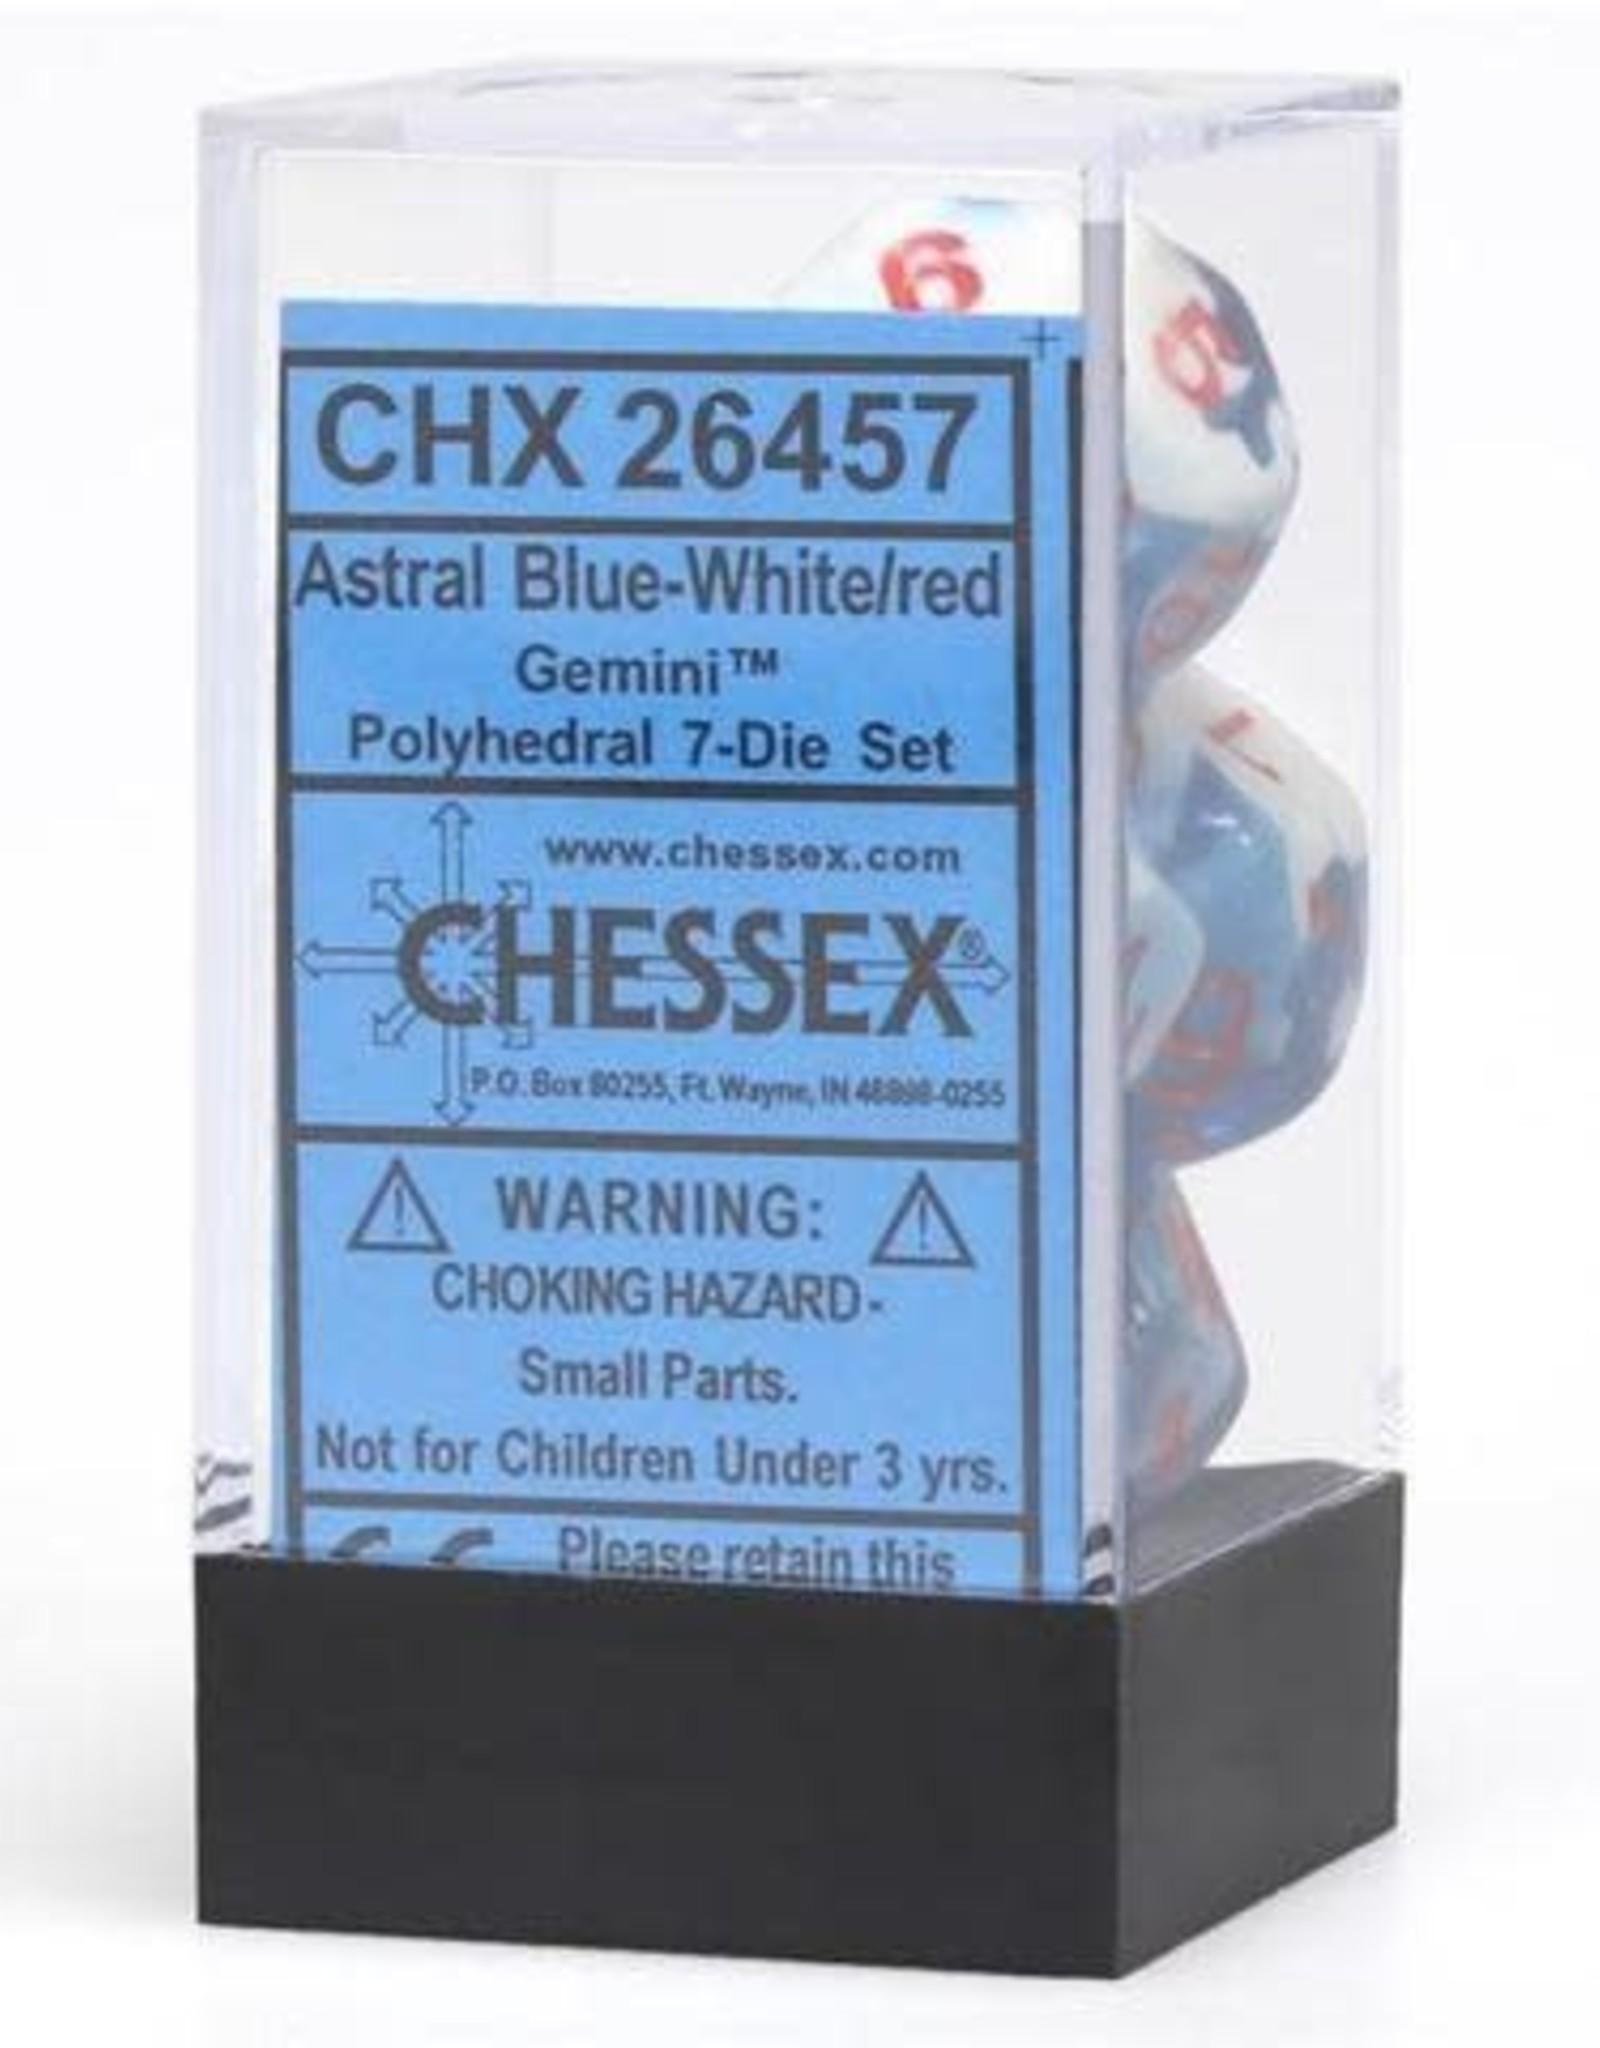 Chessex Chessex Manufacturing CHX26457 Astral Blue & White Cube Gemini